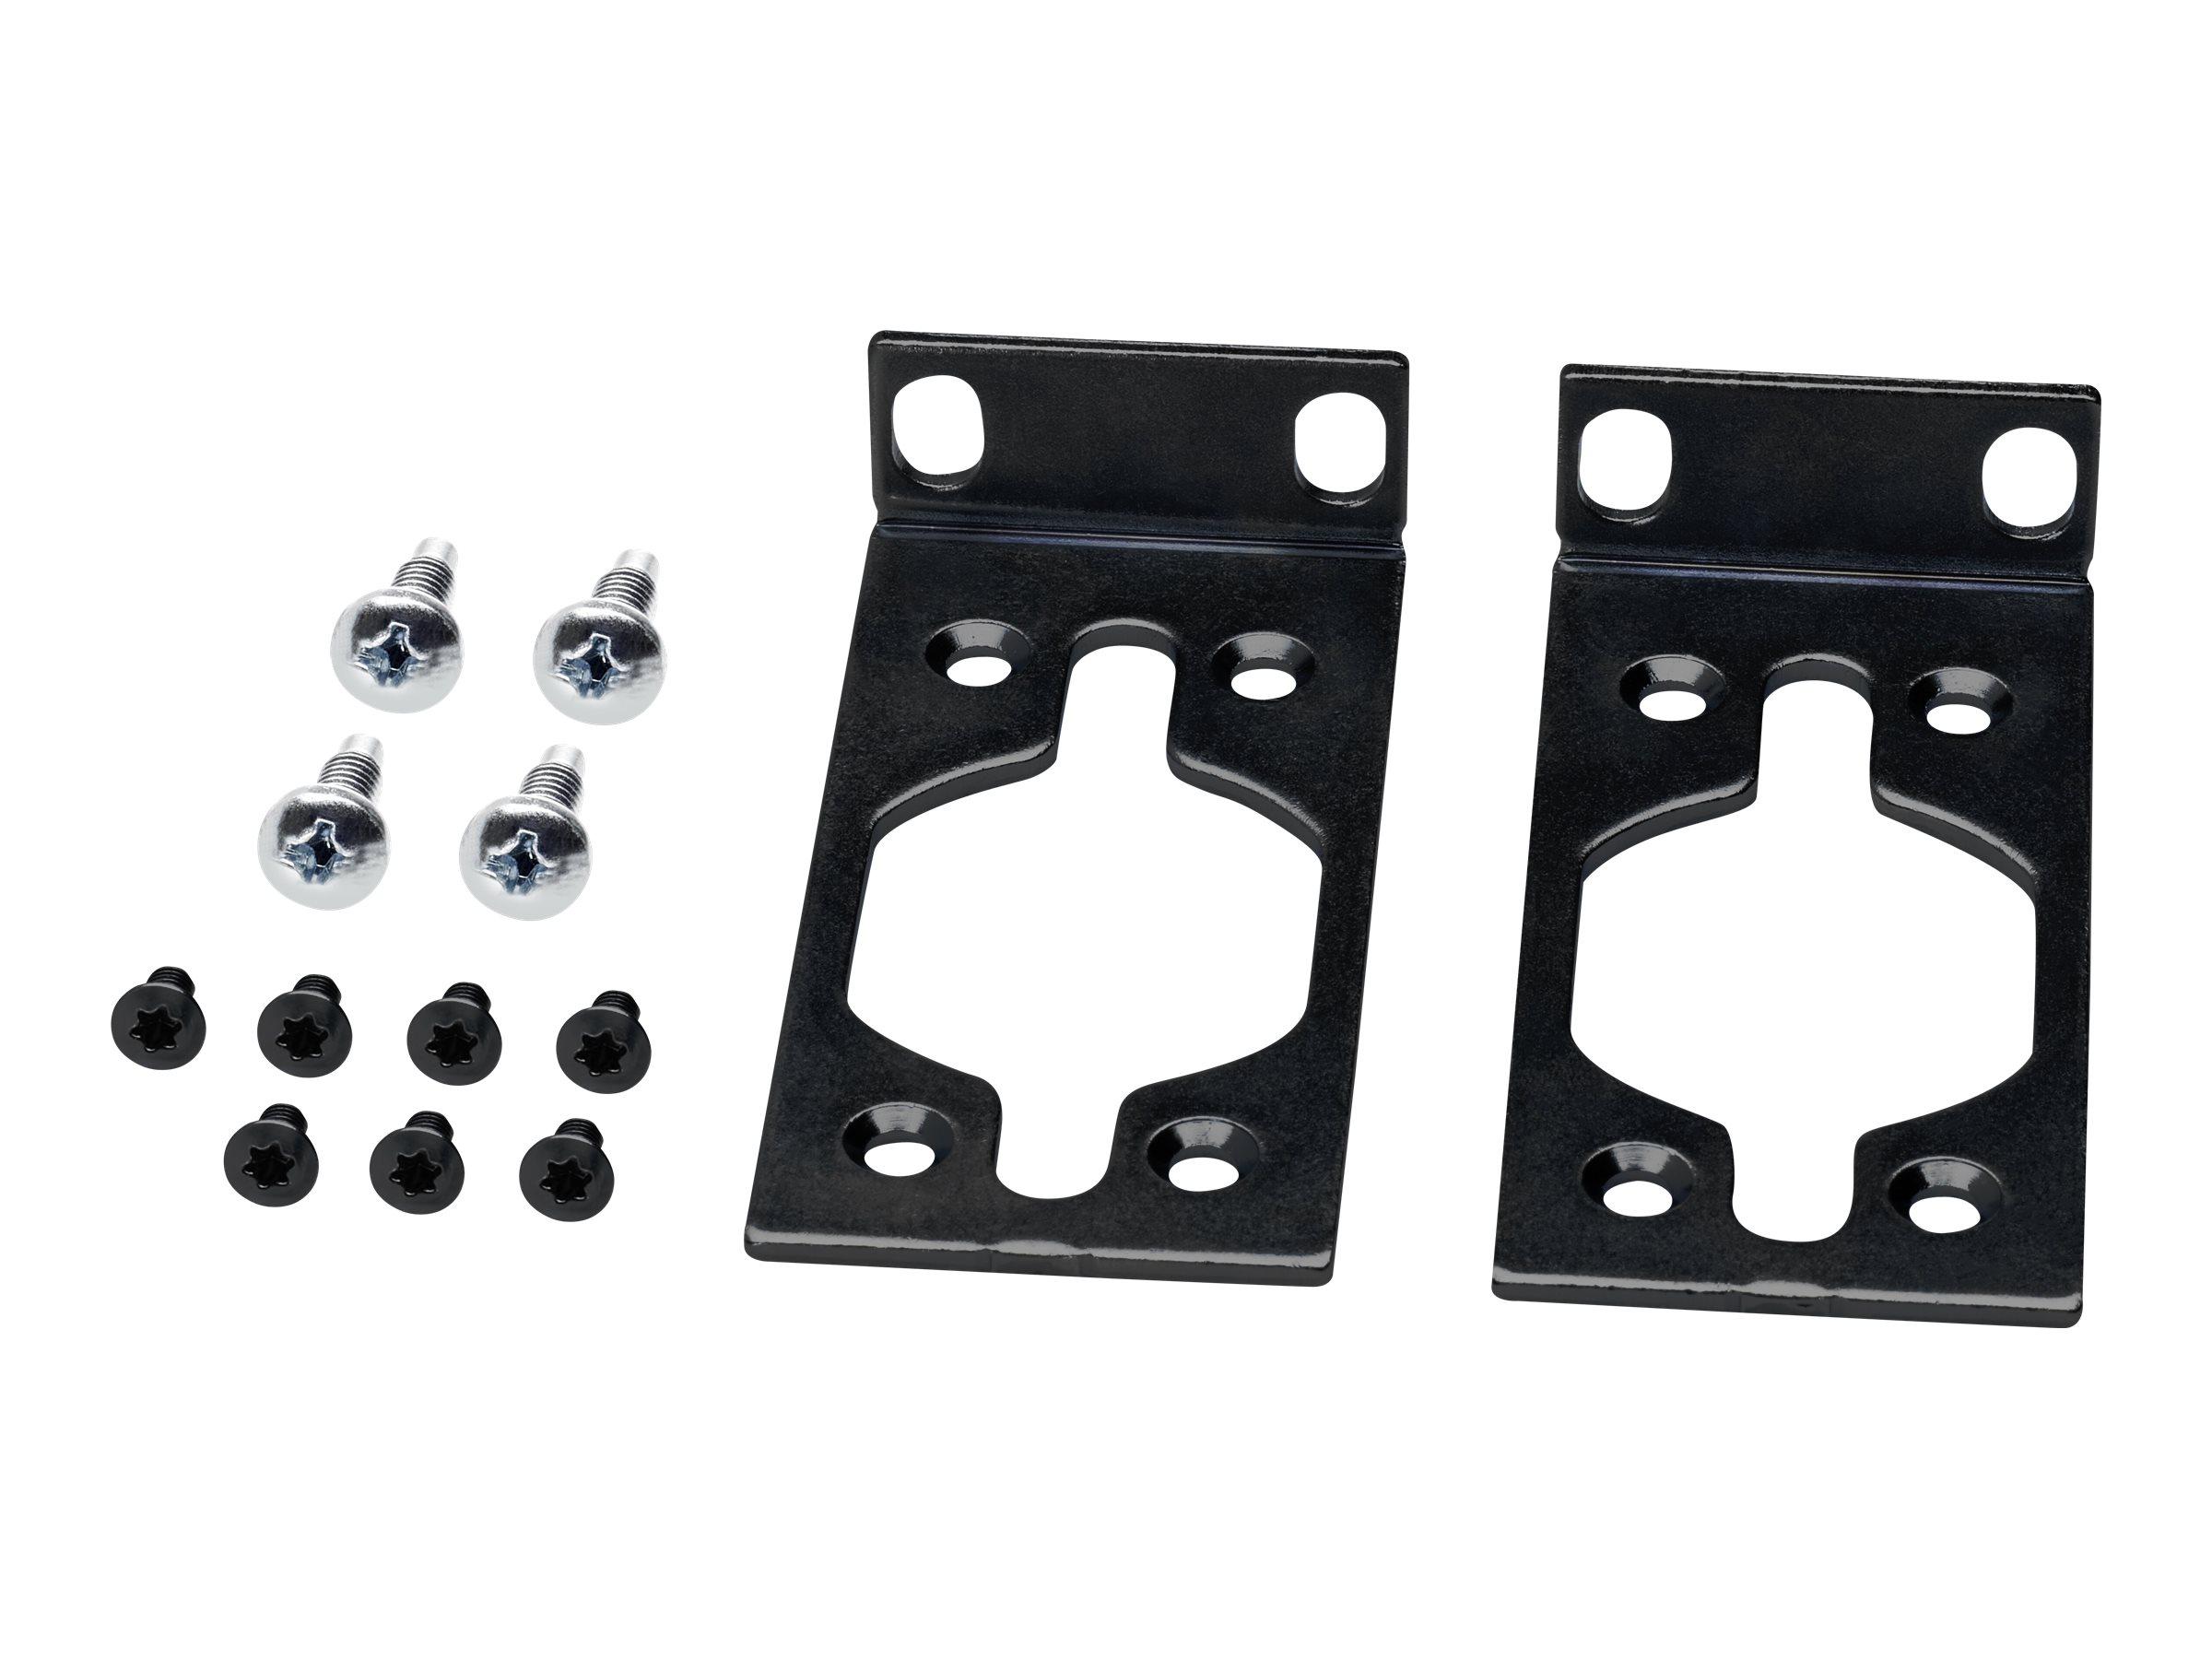 HPE Aruba X412 Universal - rack mounting kit (2 post) - 1U